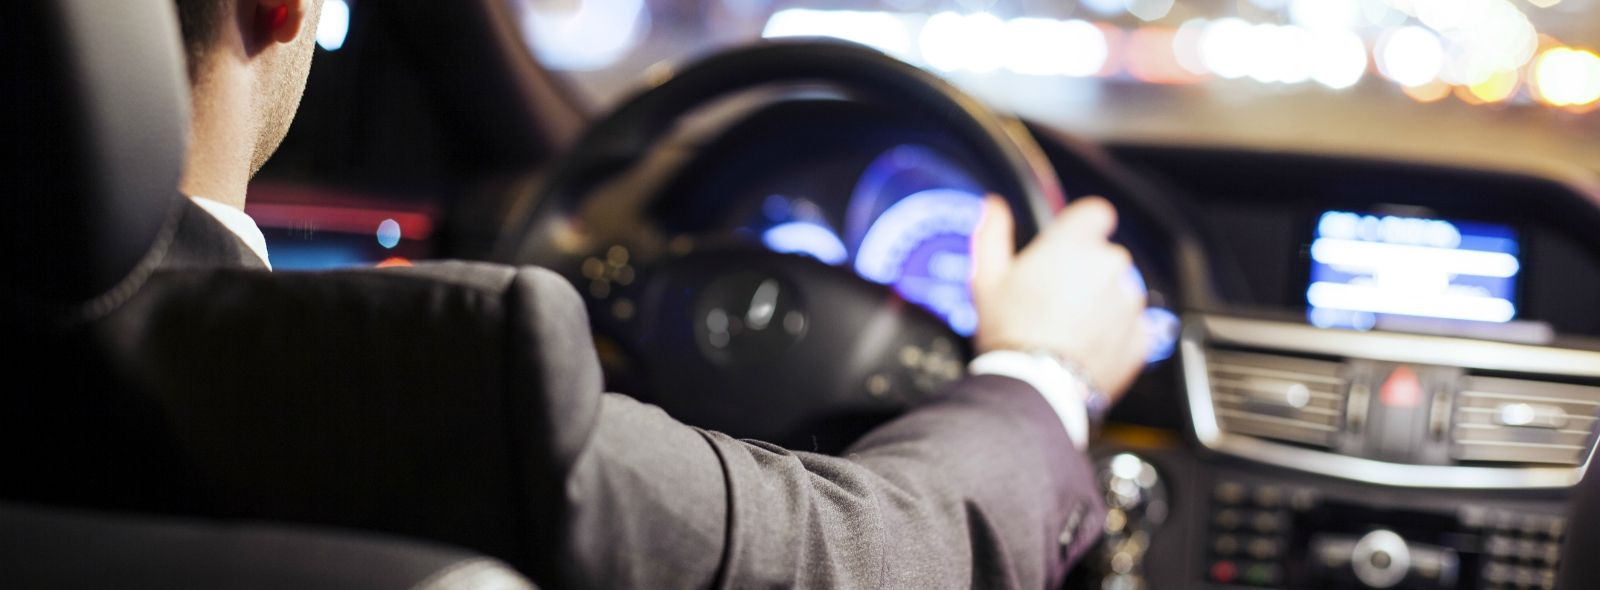 Miglior noleggio auto con conducente Milano